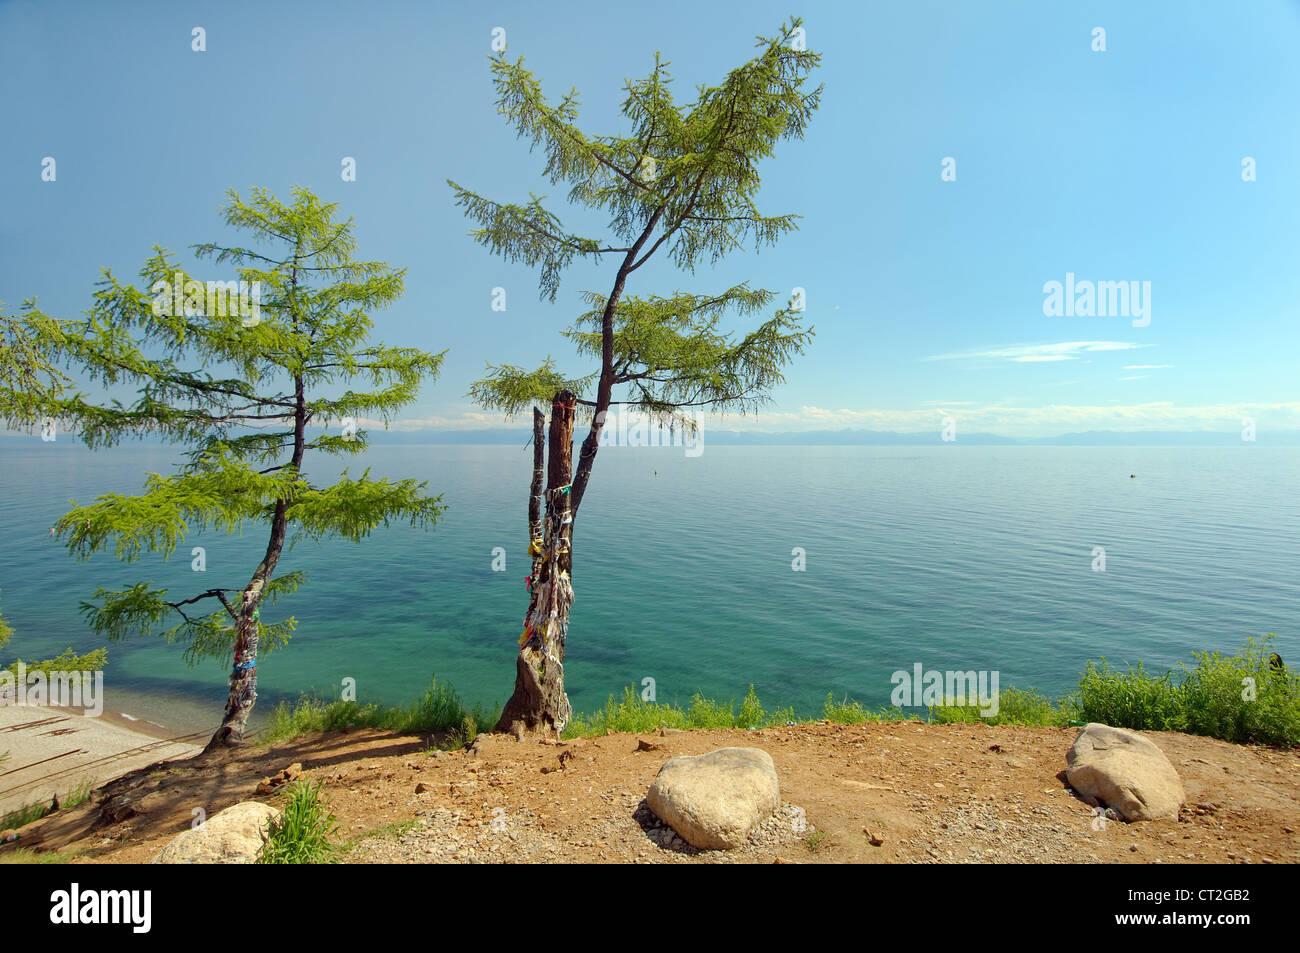 Tree of desires, settlement Listvyanka, Lake Baikal, Irkutsk region, Siberia, Russian Federation - Stock Image